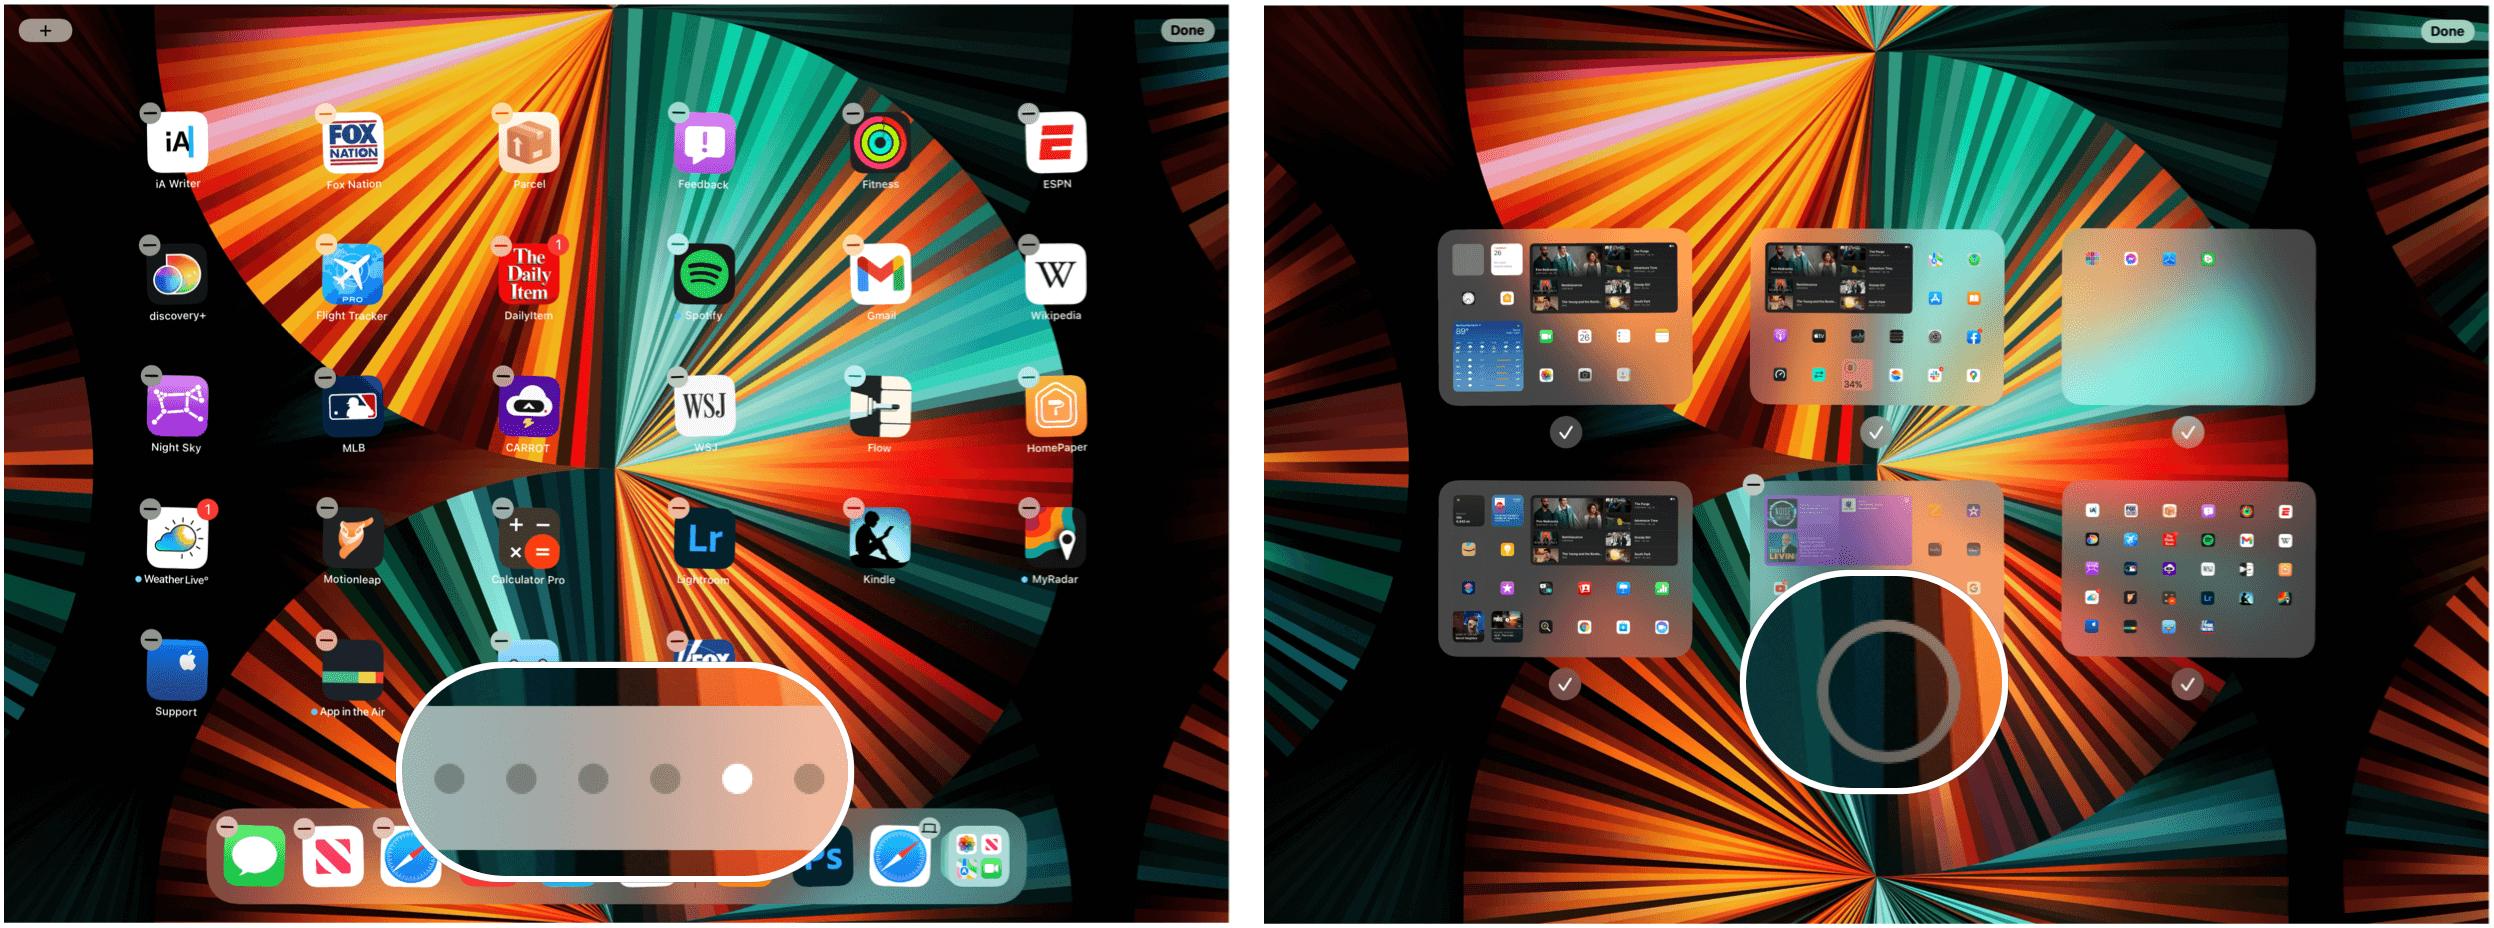 iPad adjust home screens